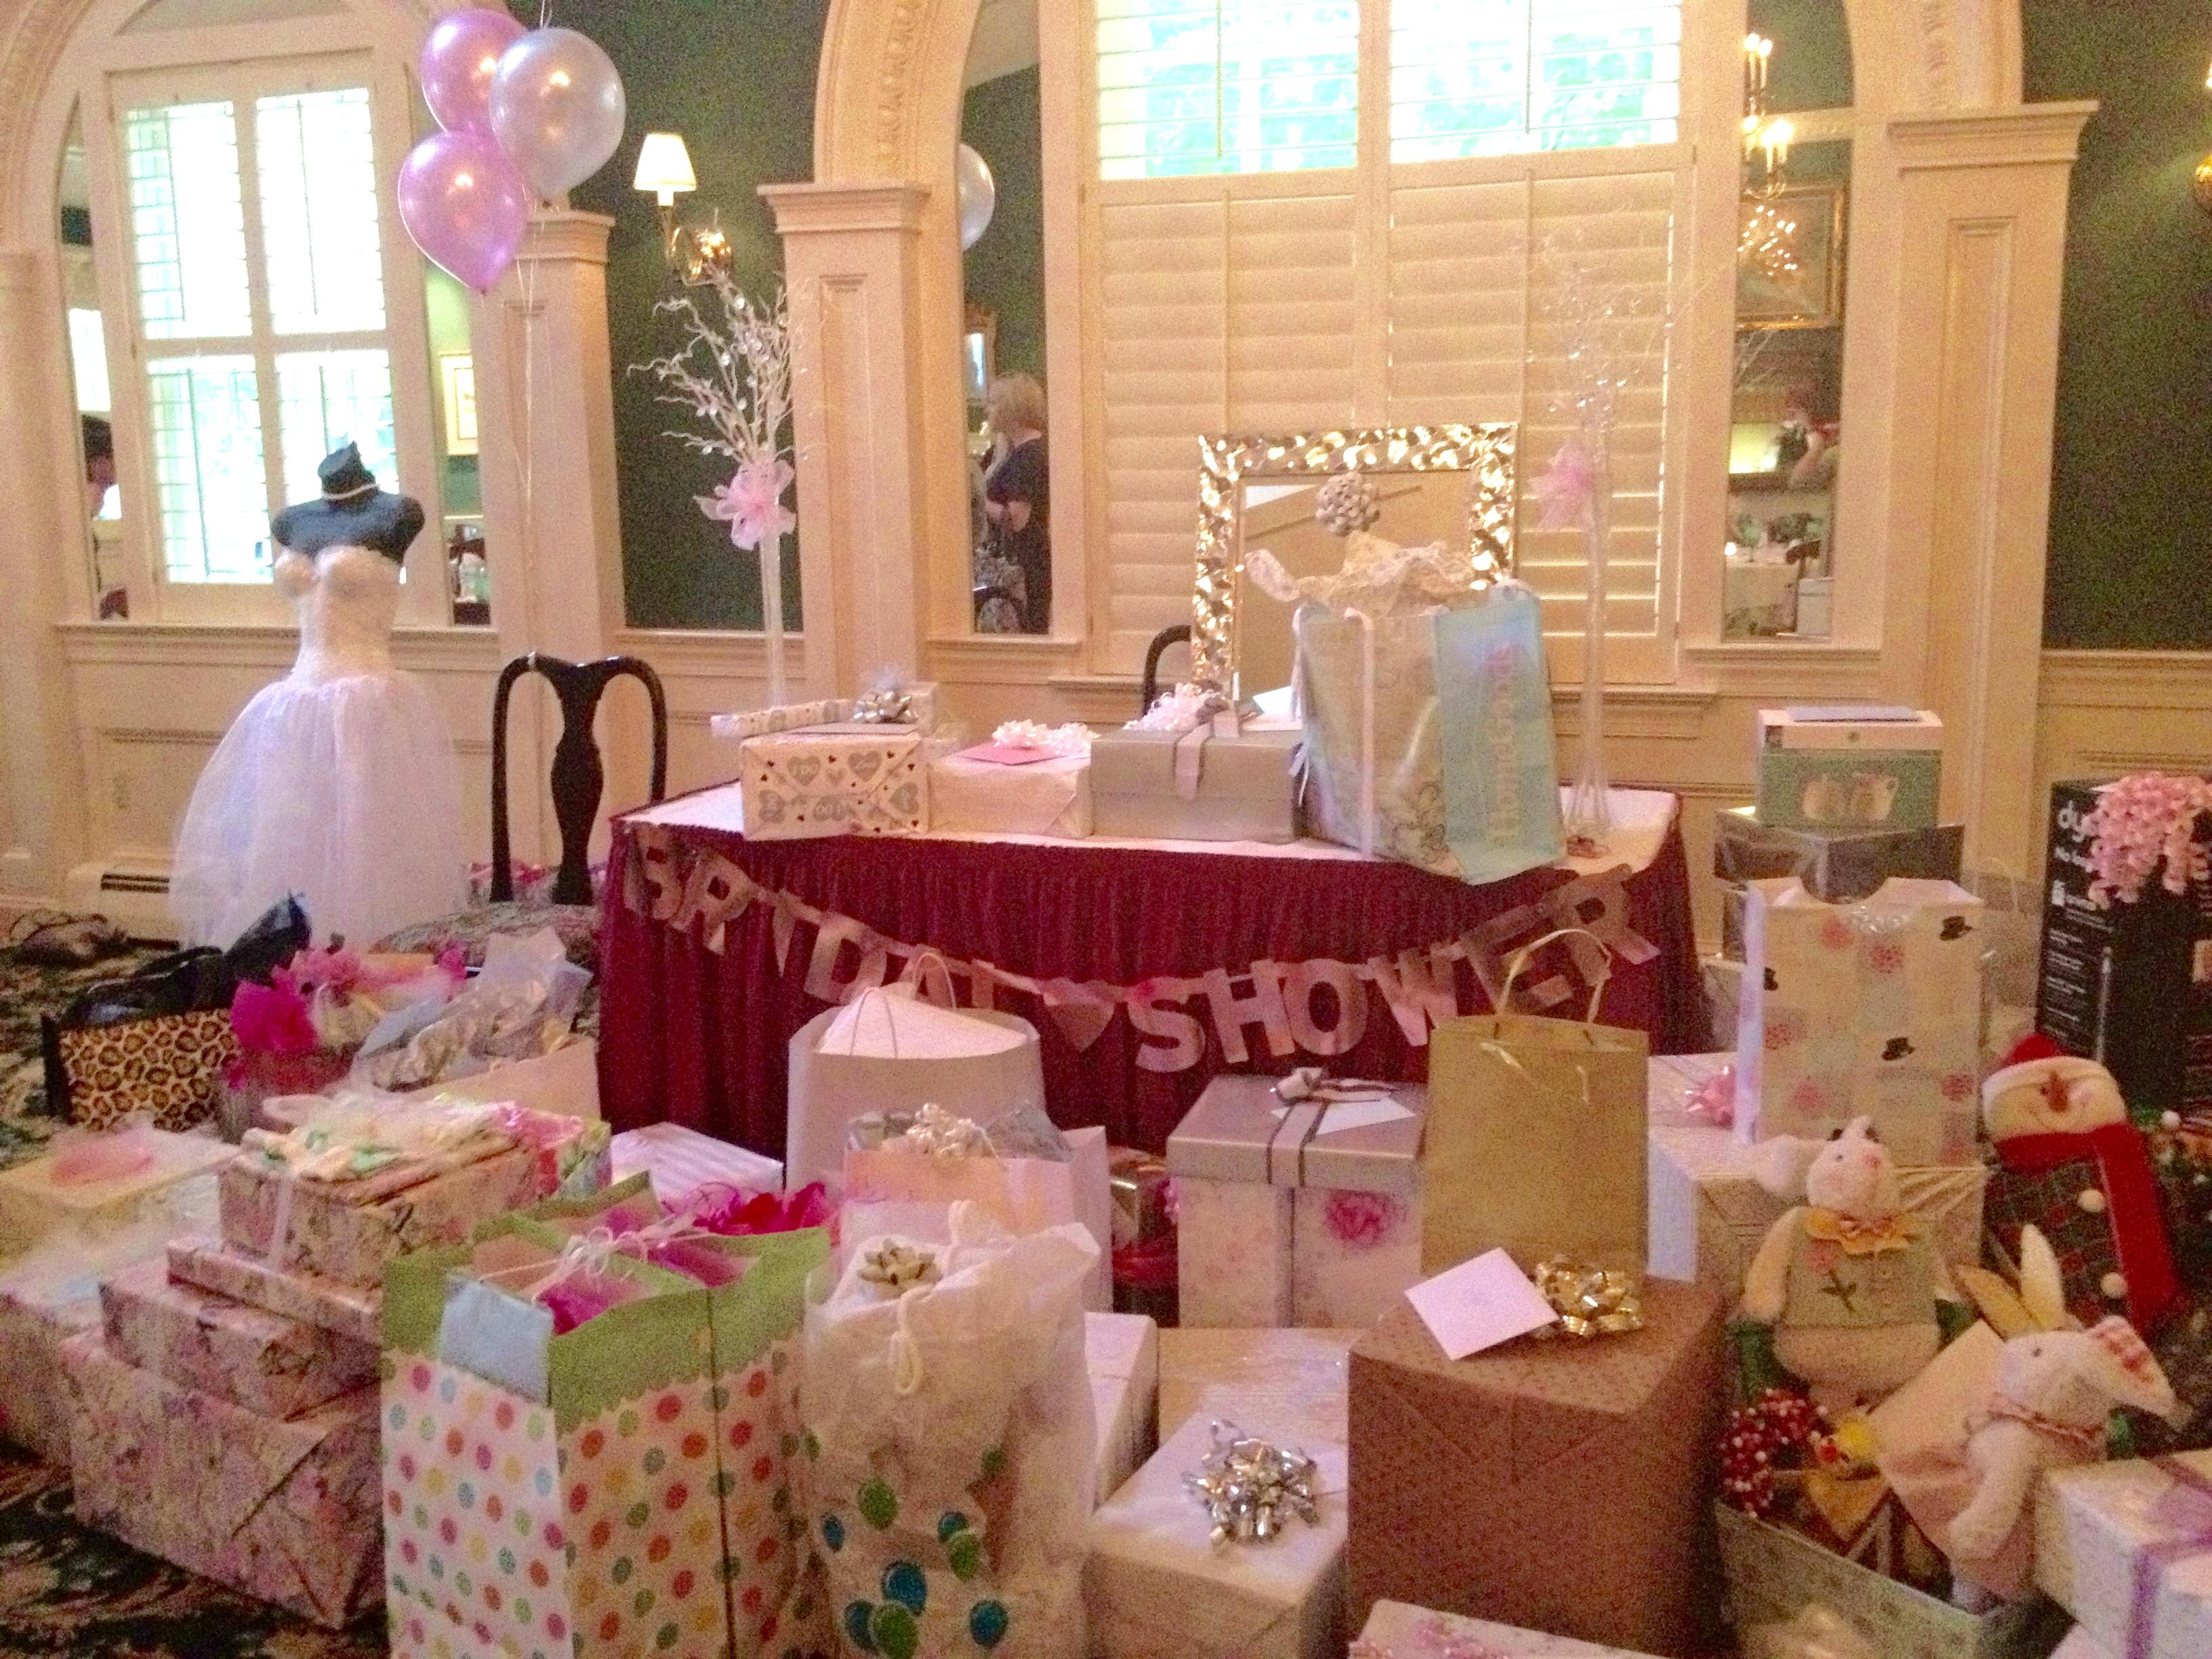 Baltimore Bridal Shower Images